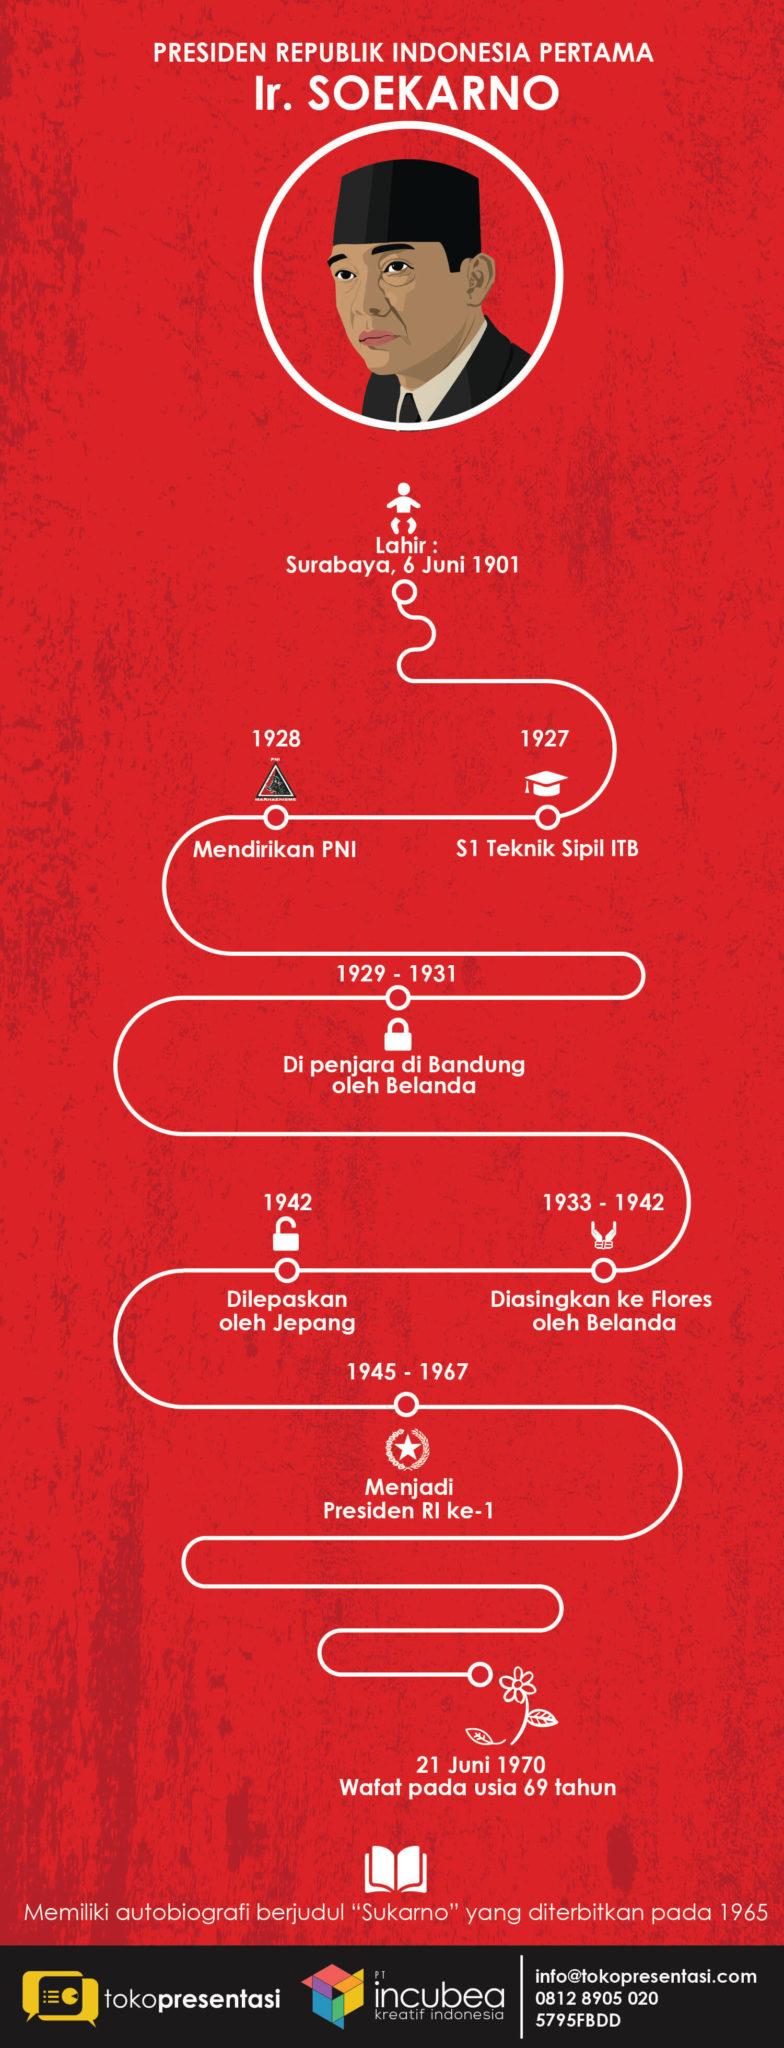 Infografis Presiden RI pertama Ir Soekarno jasa infografis tokopresentasi